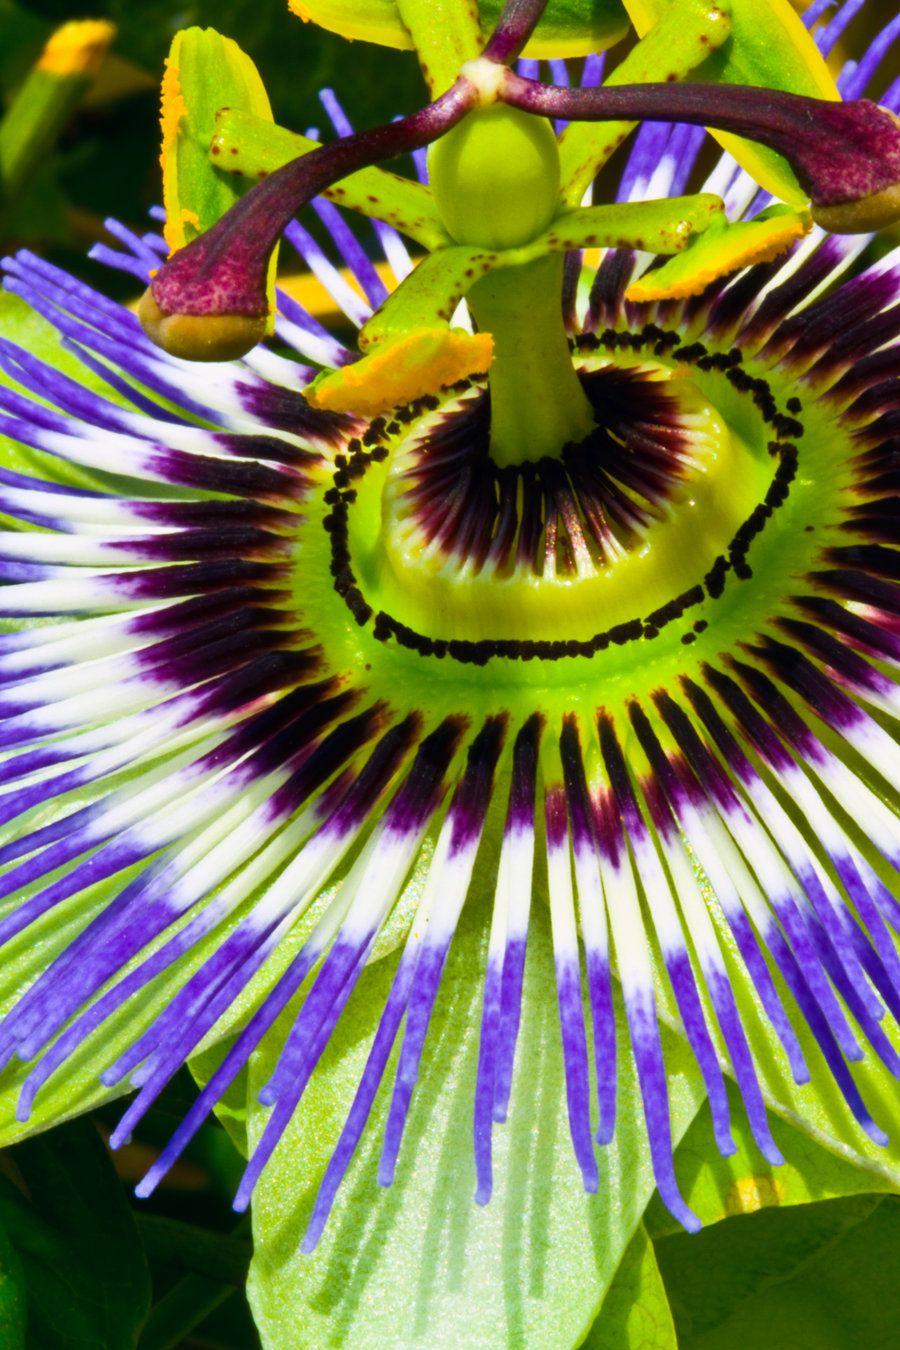 Passion flower 2 by haakenson-stock.deviantart.com on @deviantART